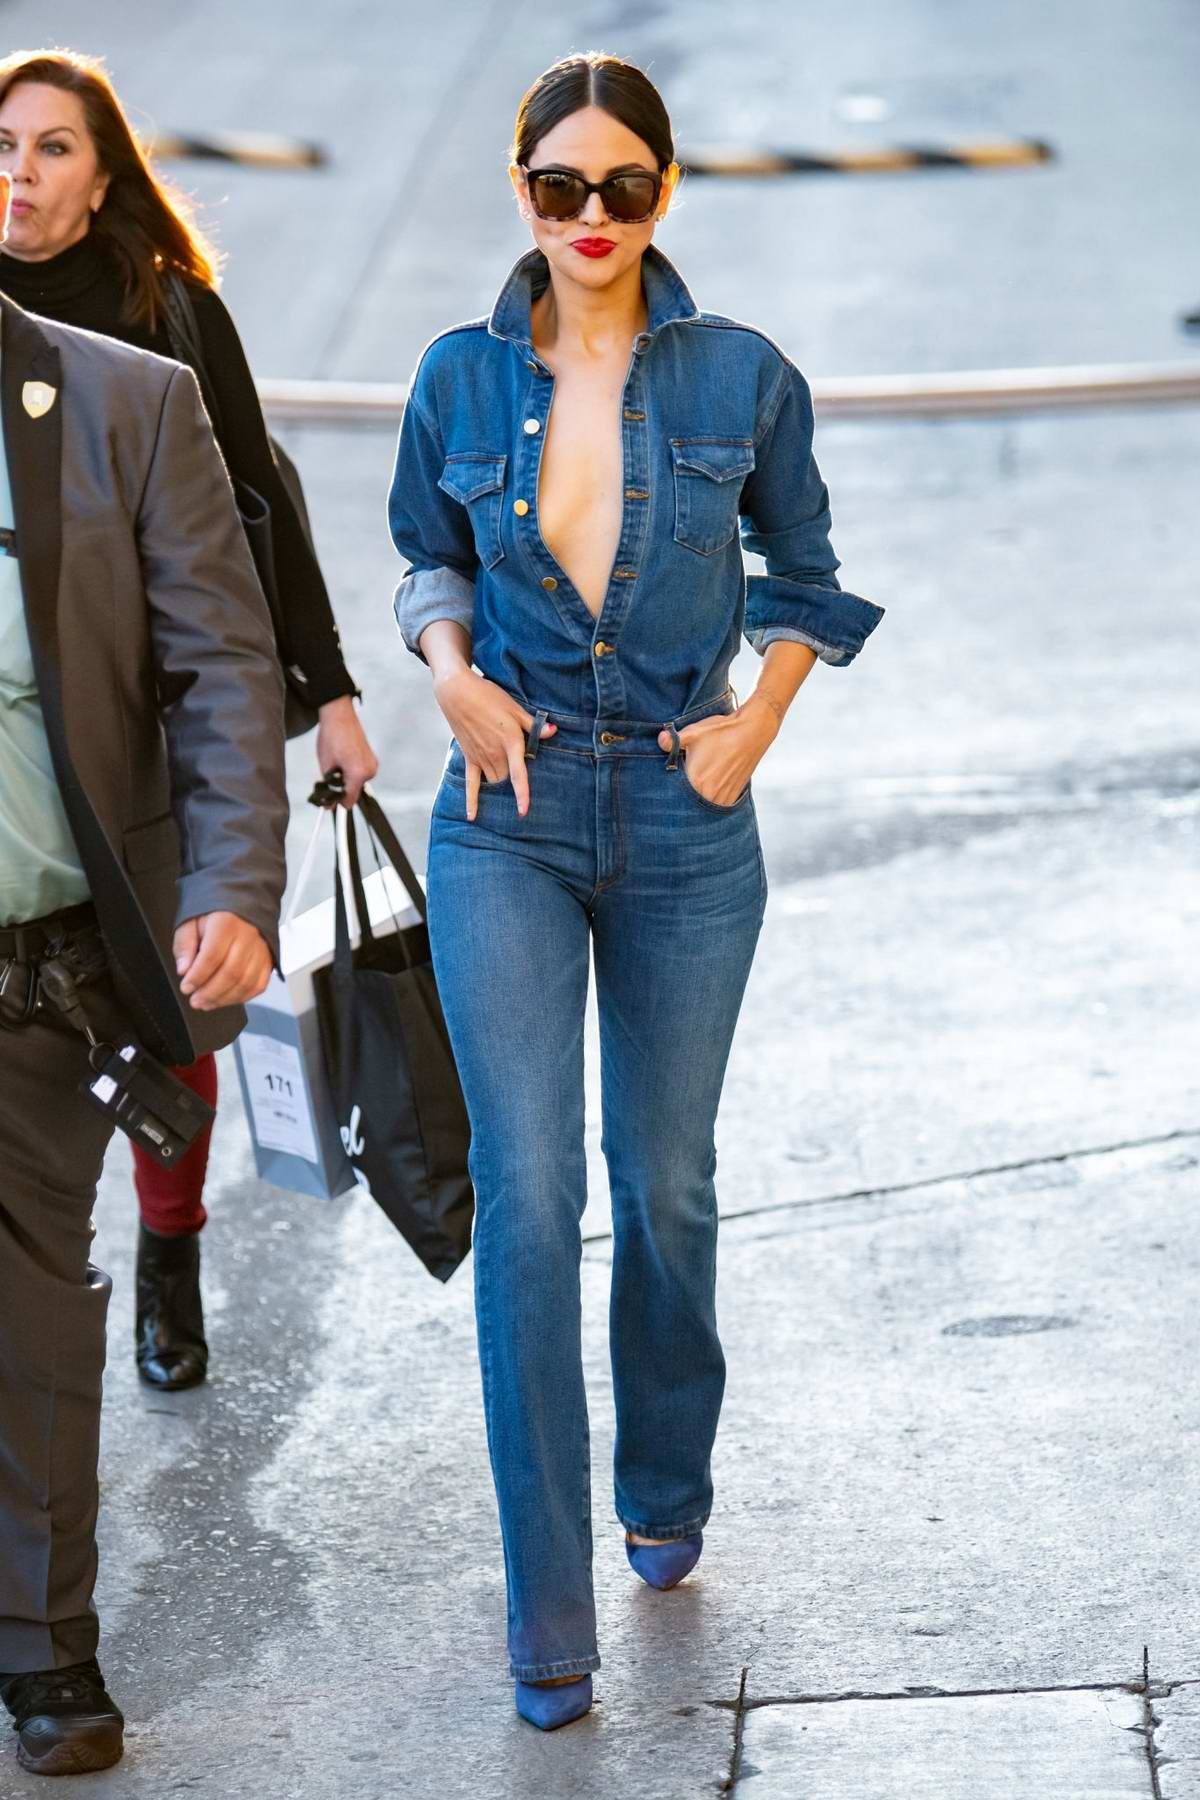 Eiza Gonzalez rocks double denim as she arrives at 'Jimmy Kimmel Live' in Hollywood, California